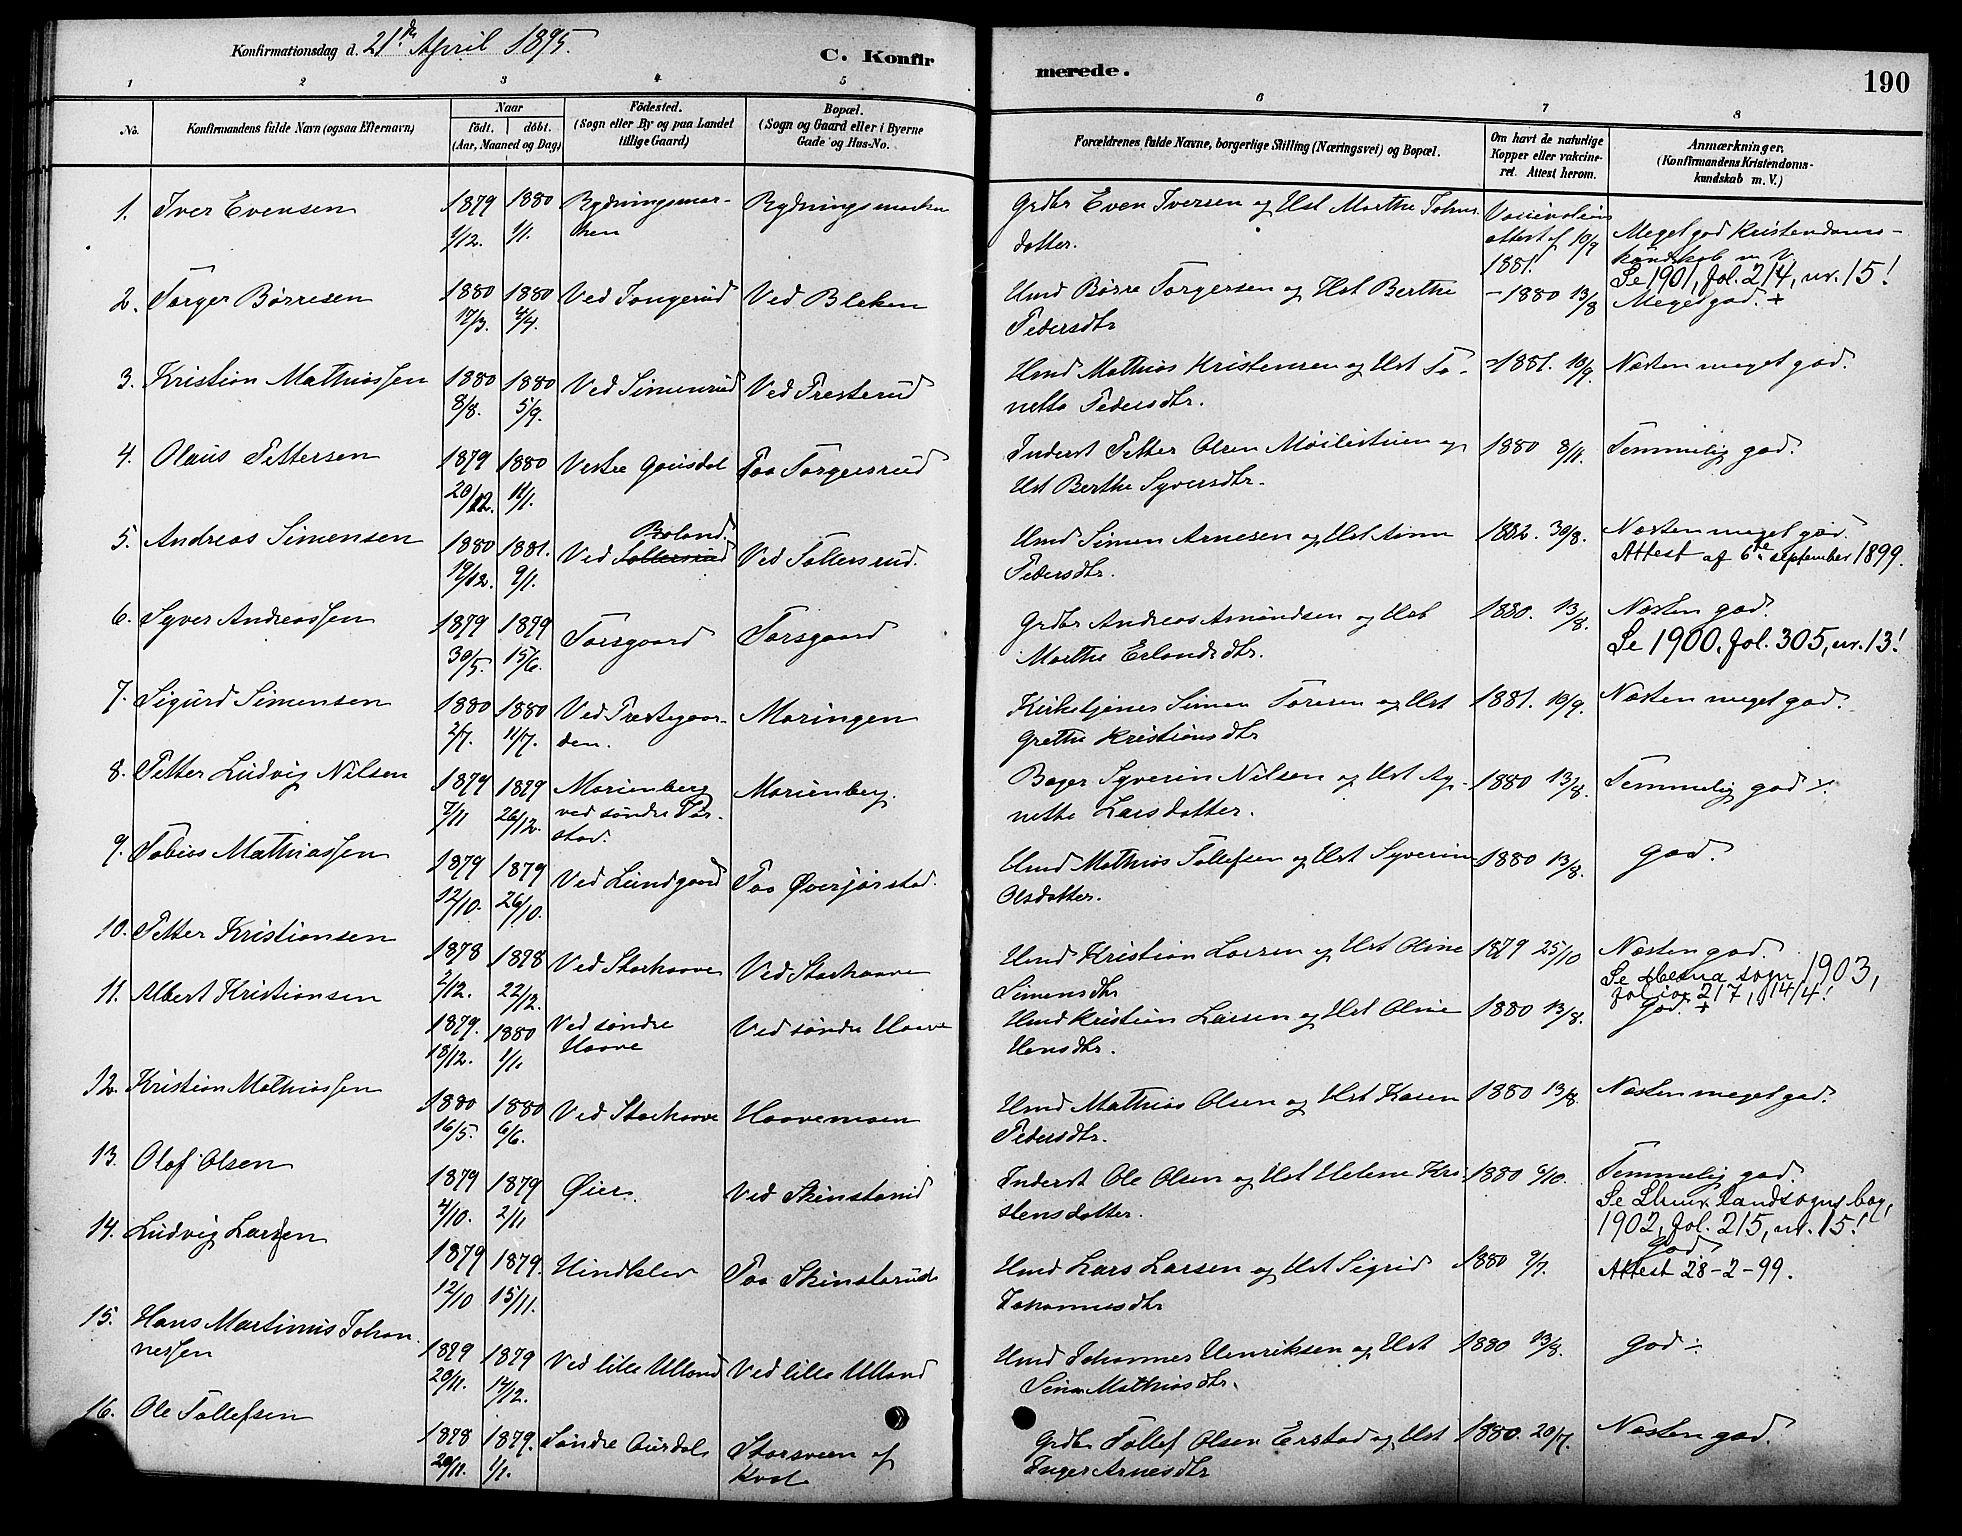 SAH, Fåberg prestekontor, Ministerialbok nr. 8, 1879-1898, s. 190